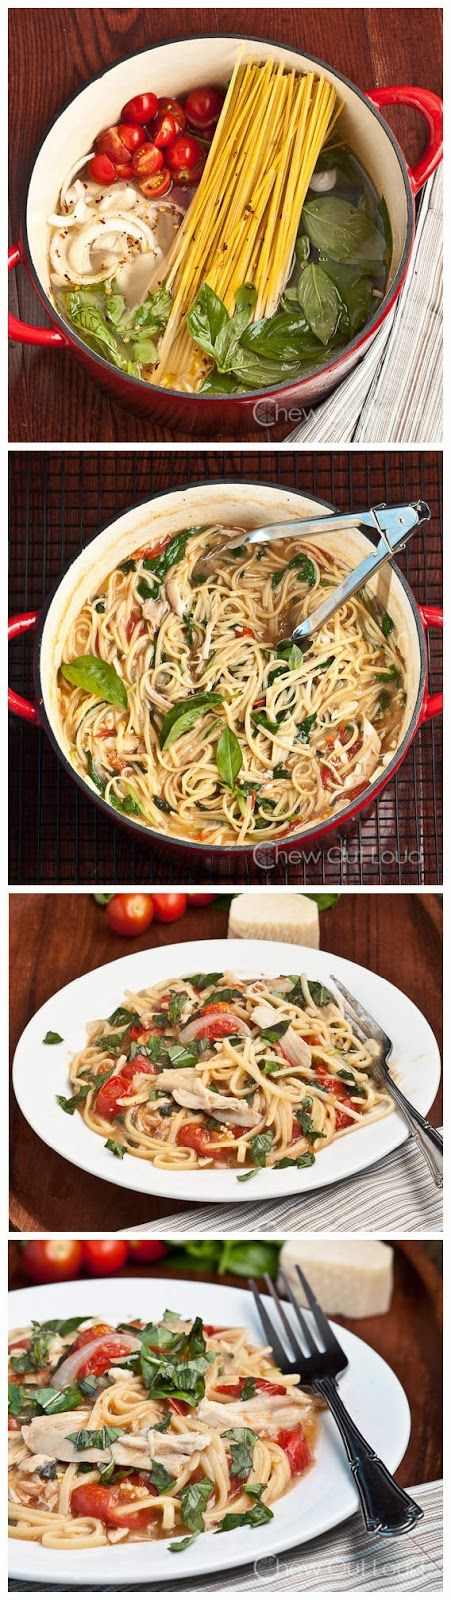 Amazing One Pot Pasta (Tomato Basil) - I wonder if it would still taste good with no basil...